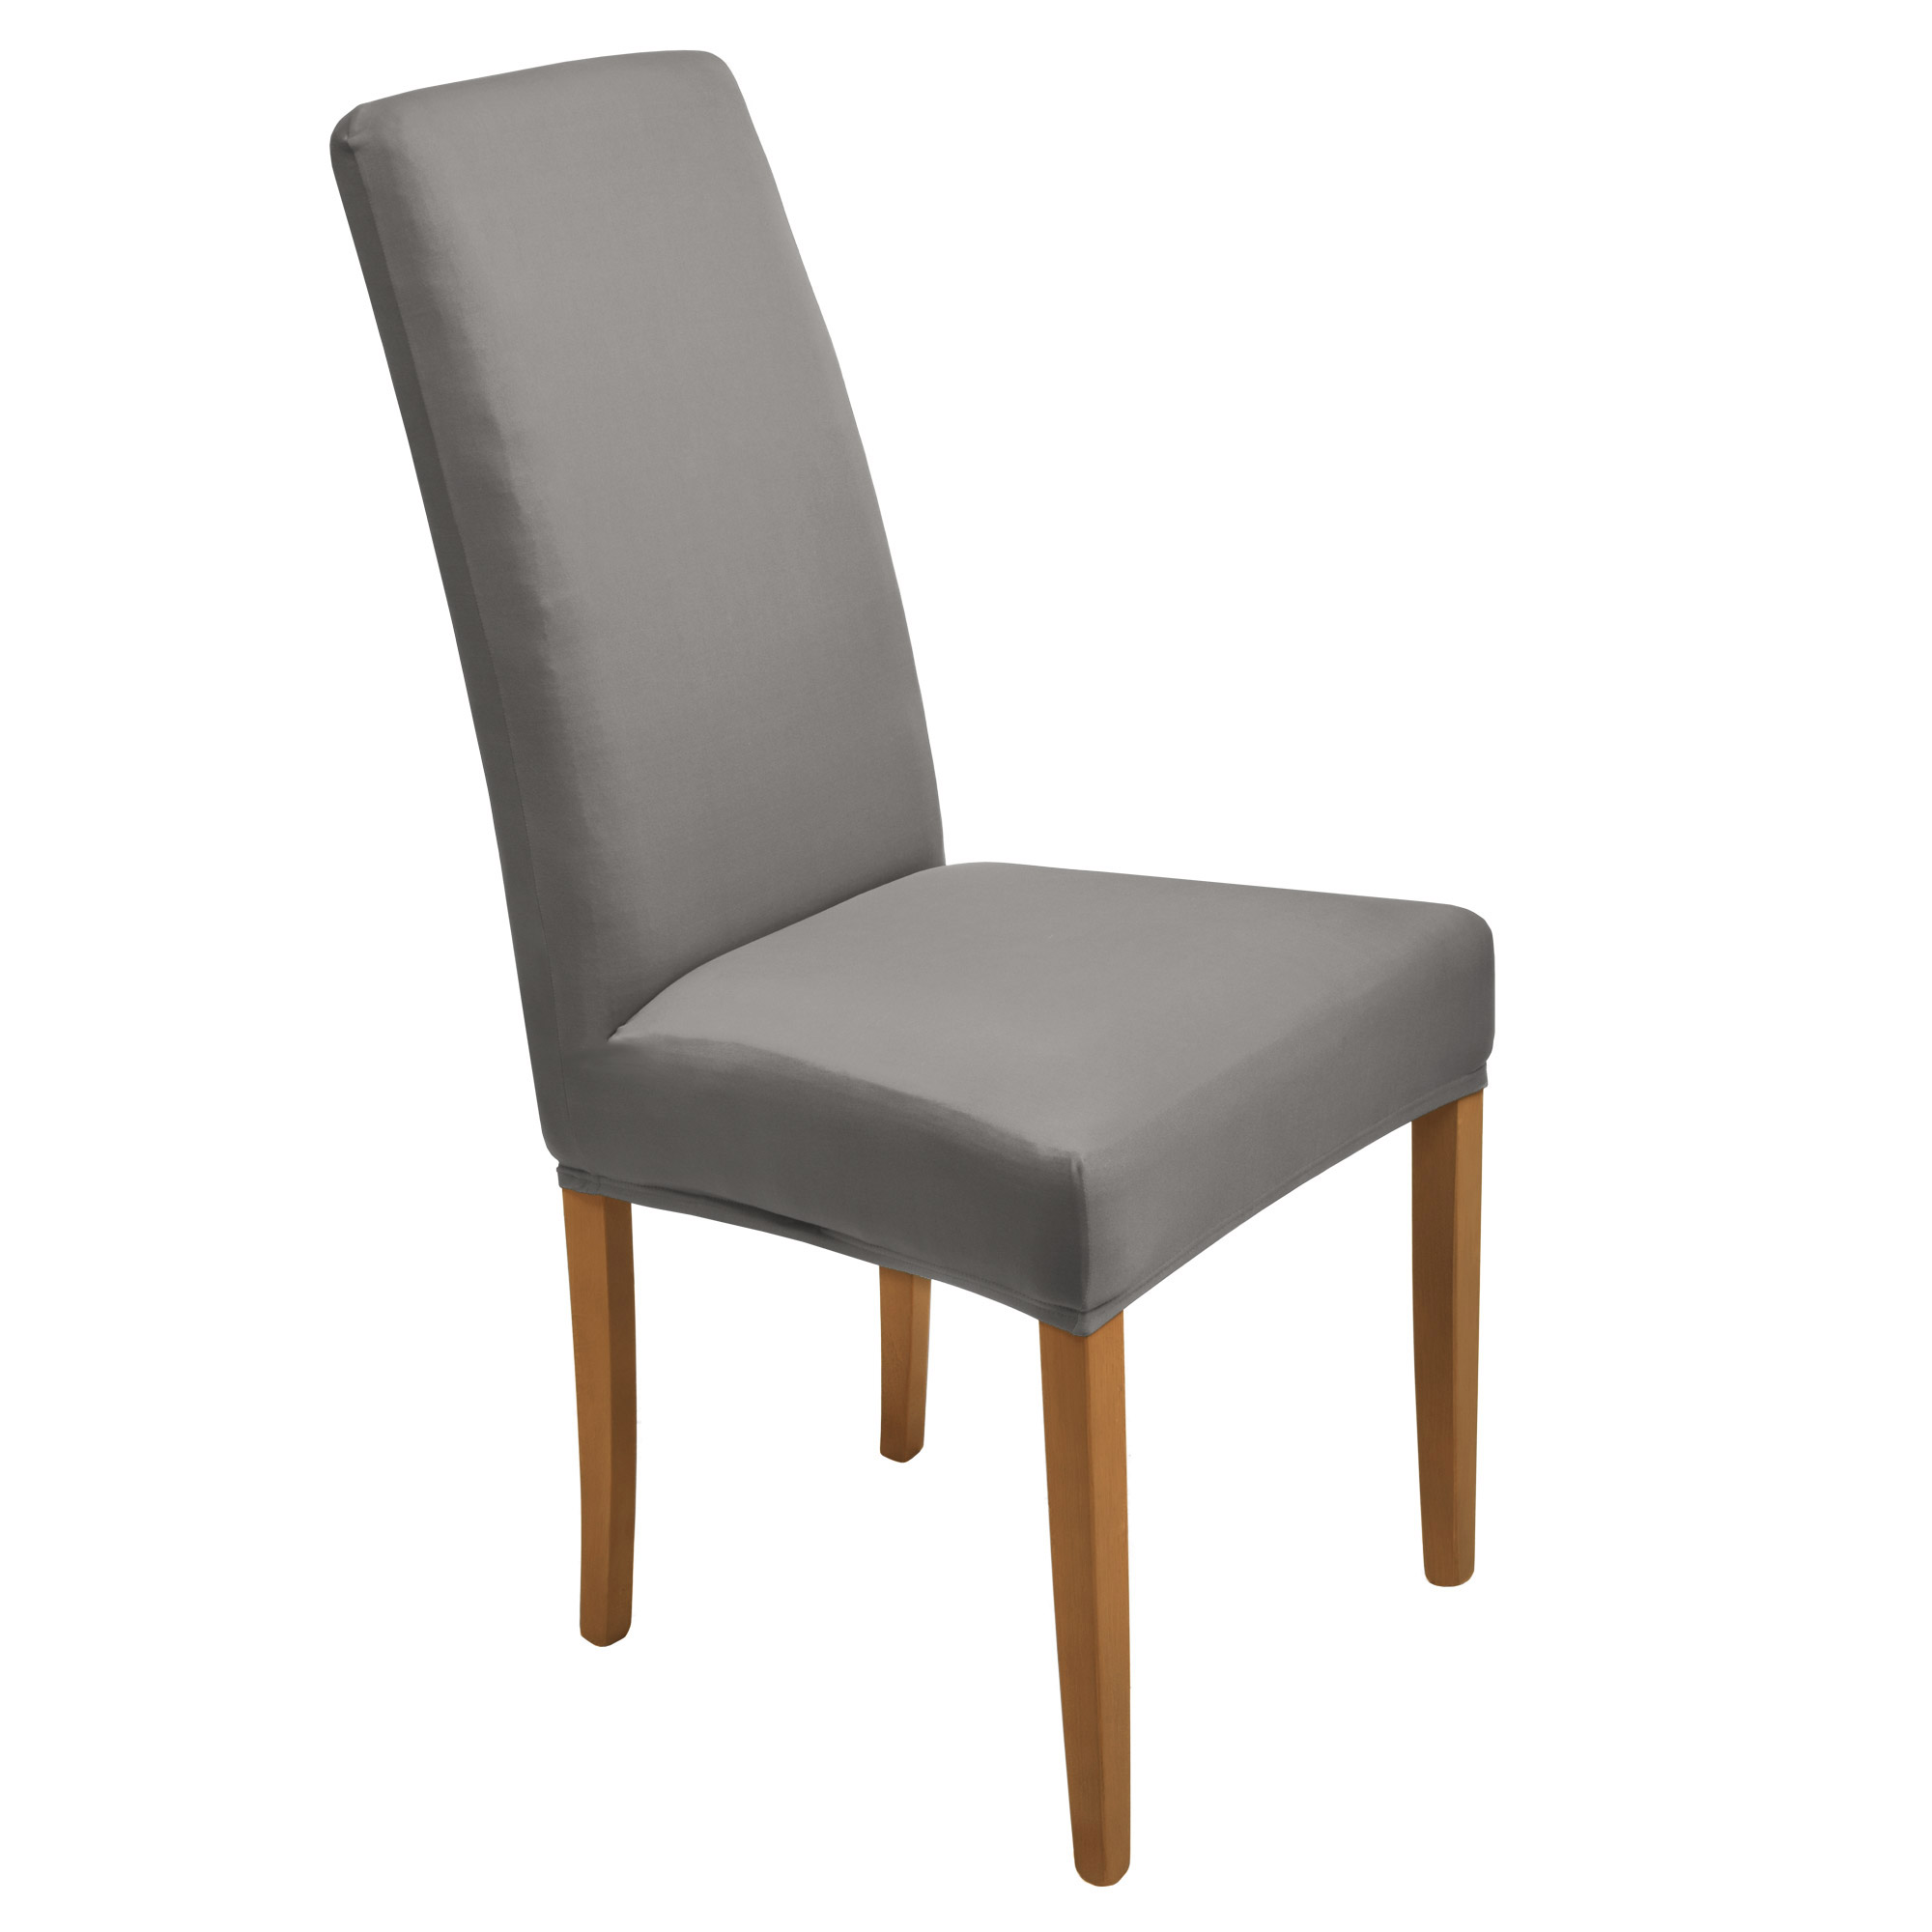 stuhlhussen anthrazit stretch hussen universell stuhlbezug stuhl berzug grau ebay. Black Bedroom Furniture Sets. Home Design Ideas